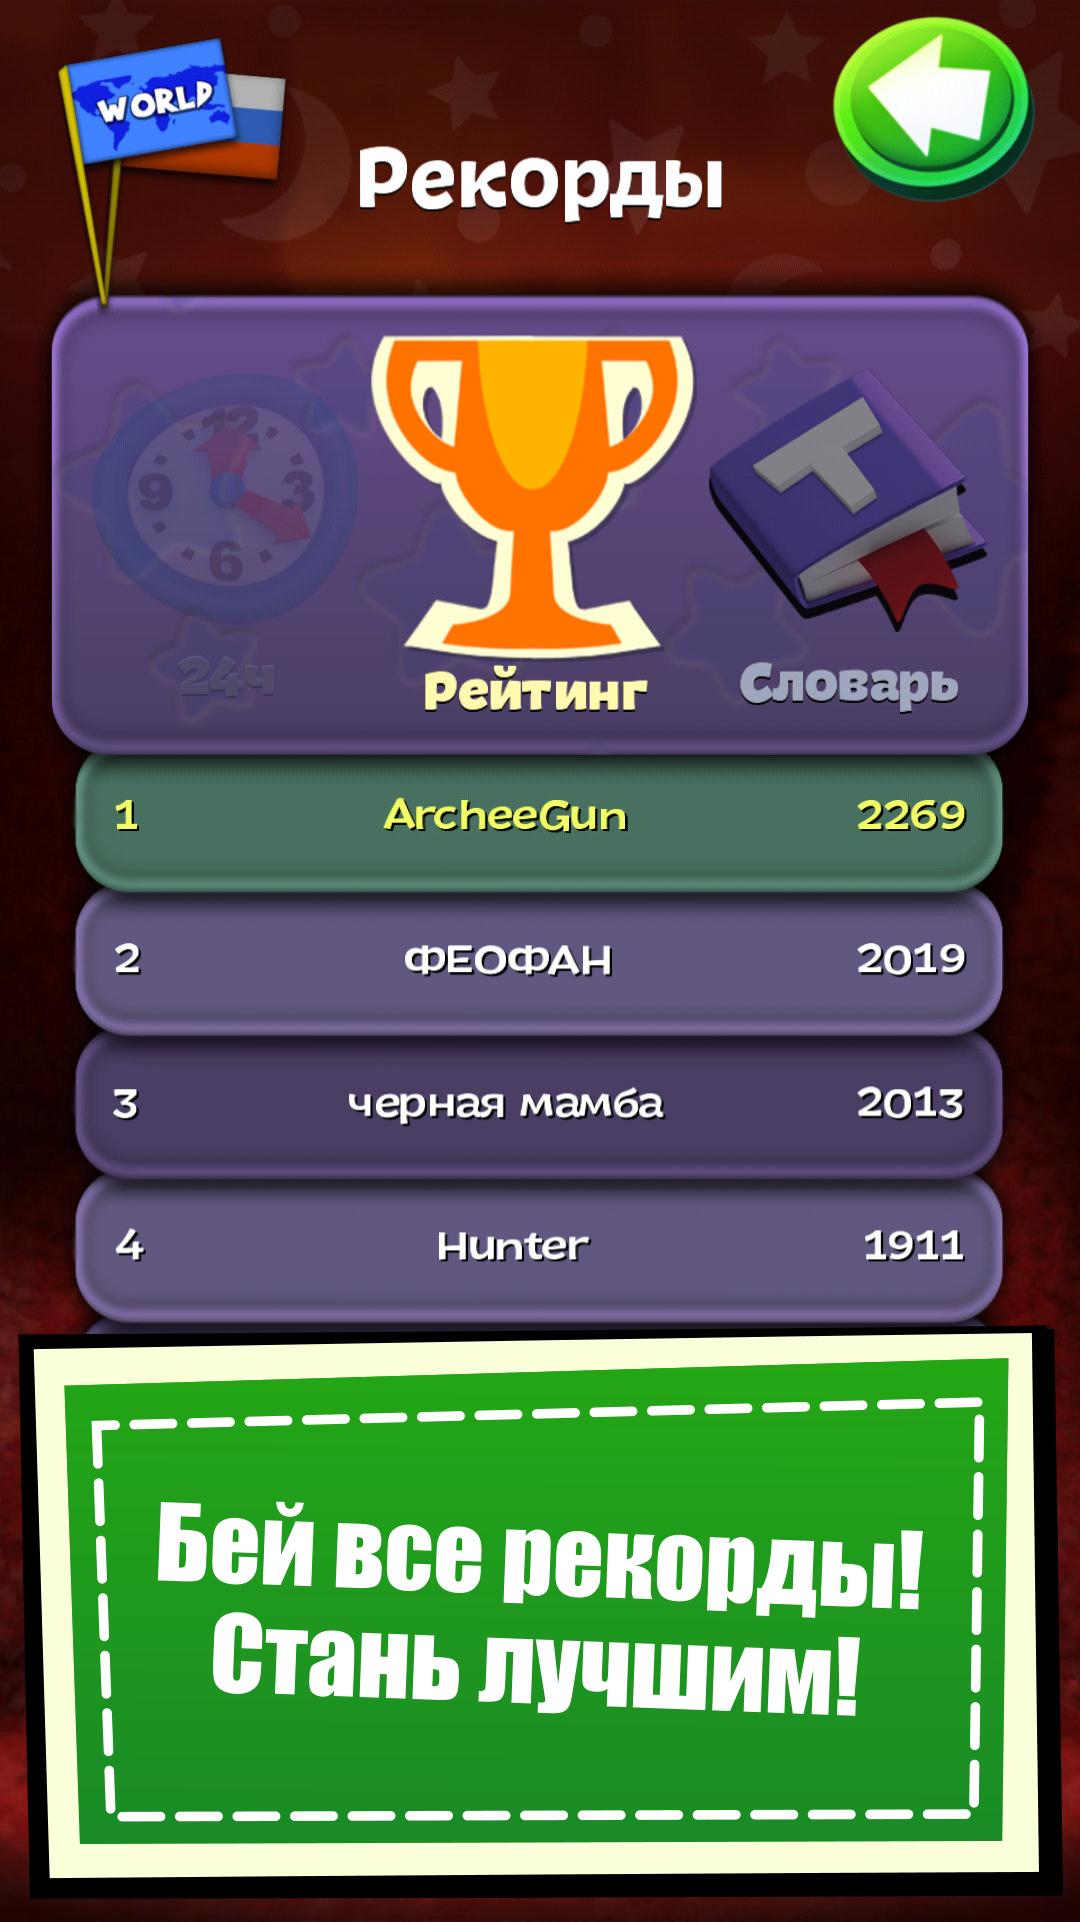 toywords_скриншот_рекорды_топ_battle_дуэль_башня_tower